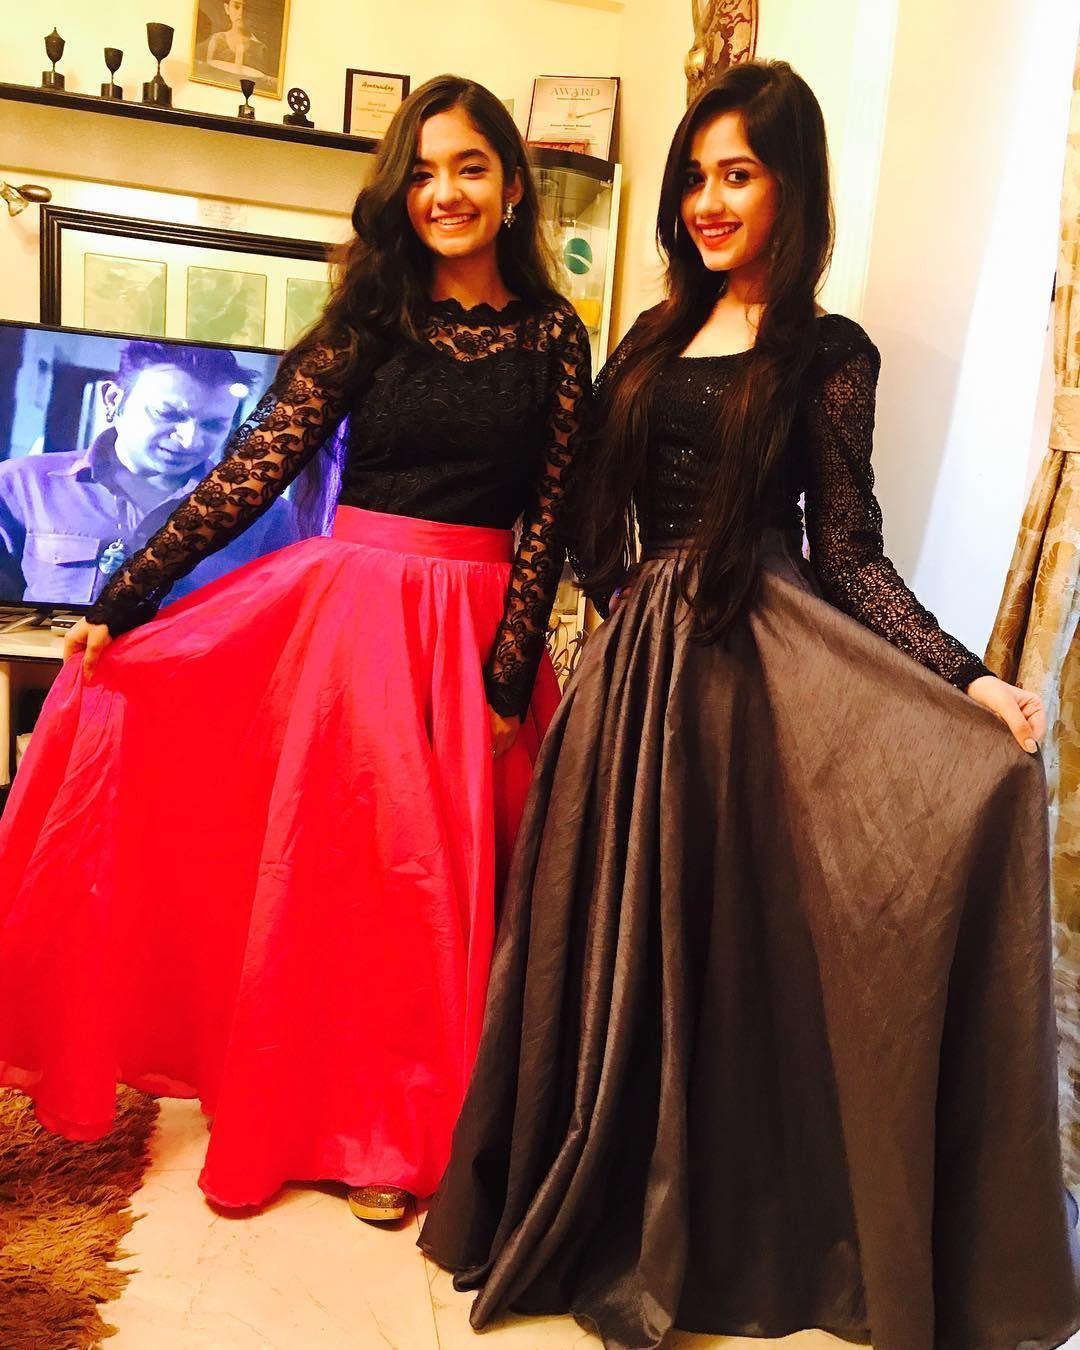 Jannat zubair pink dress  Pin by Jayana Shah on Actresses  Pinterest  Ootd Instagram and